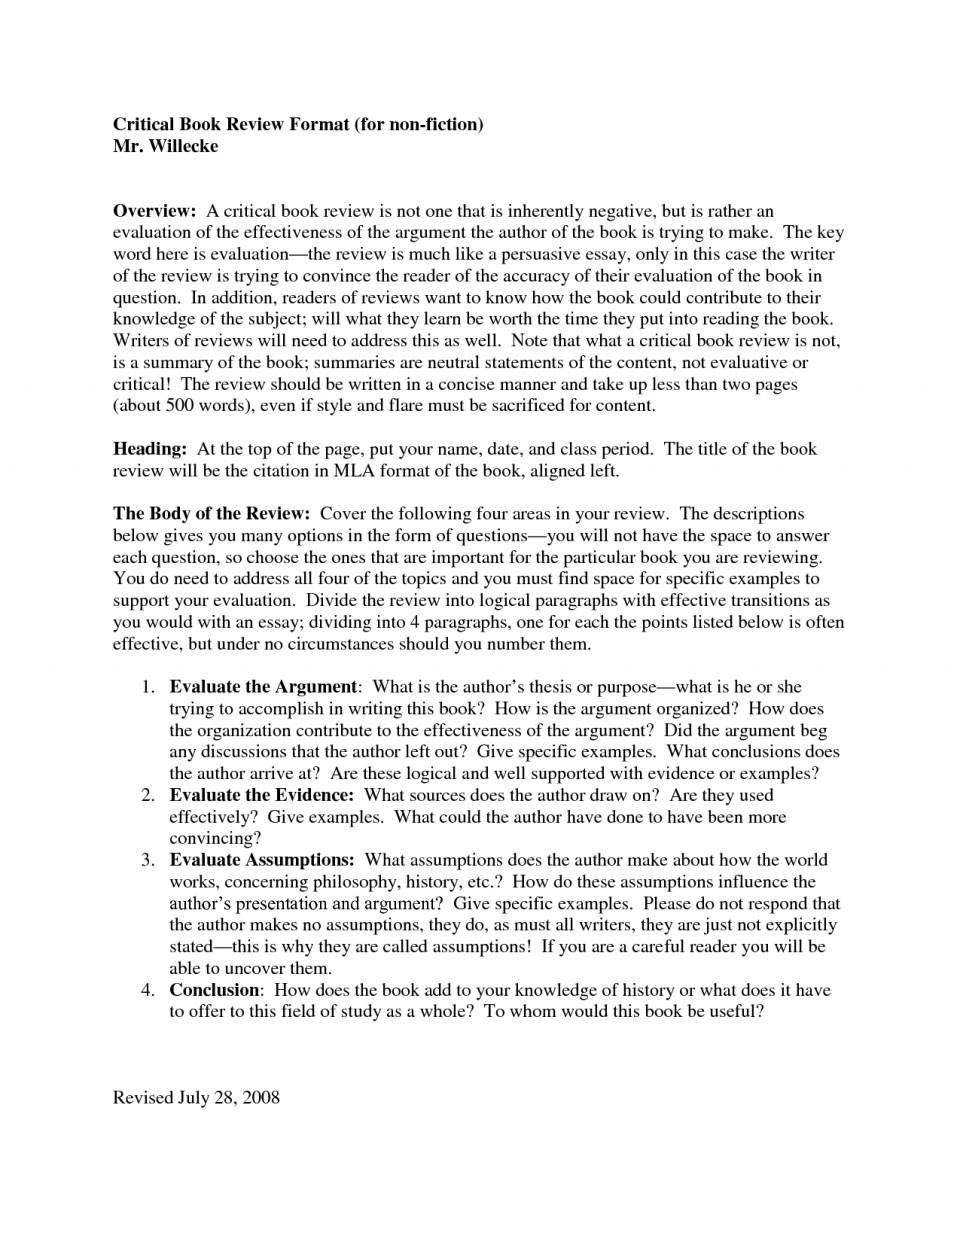 Master thesis vocabulary